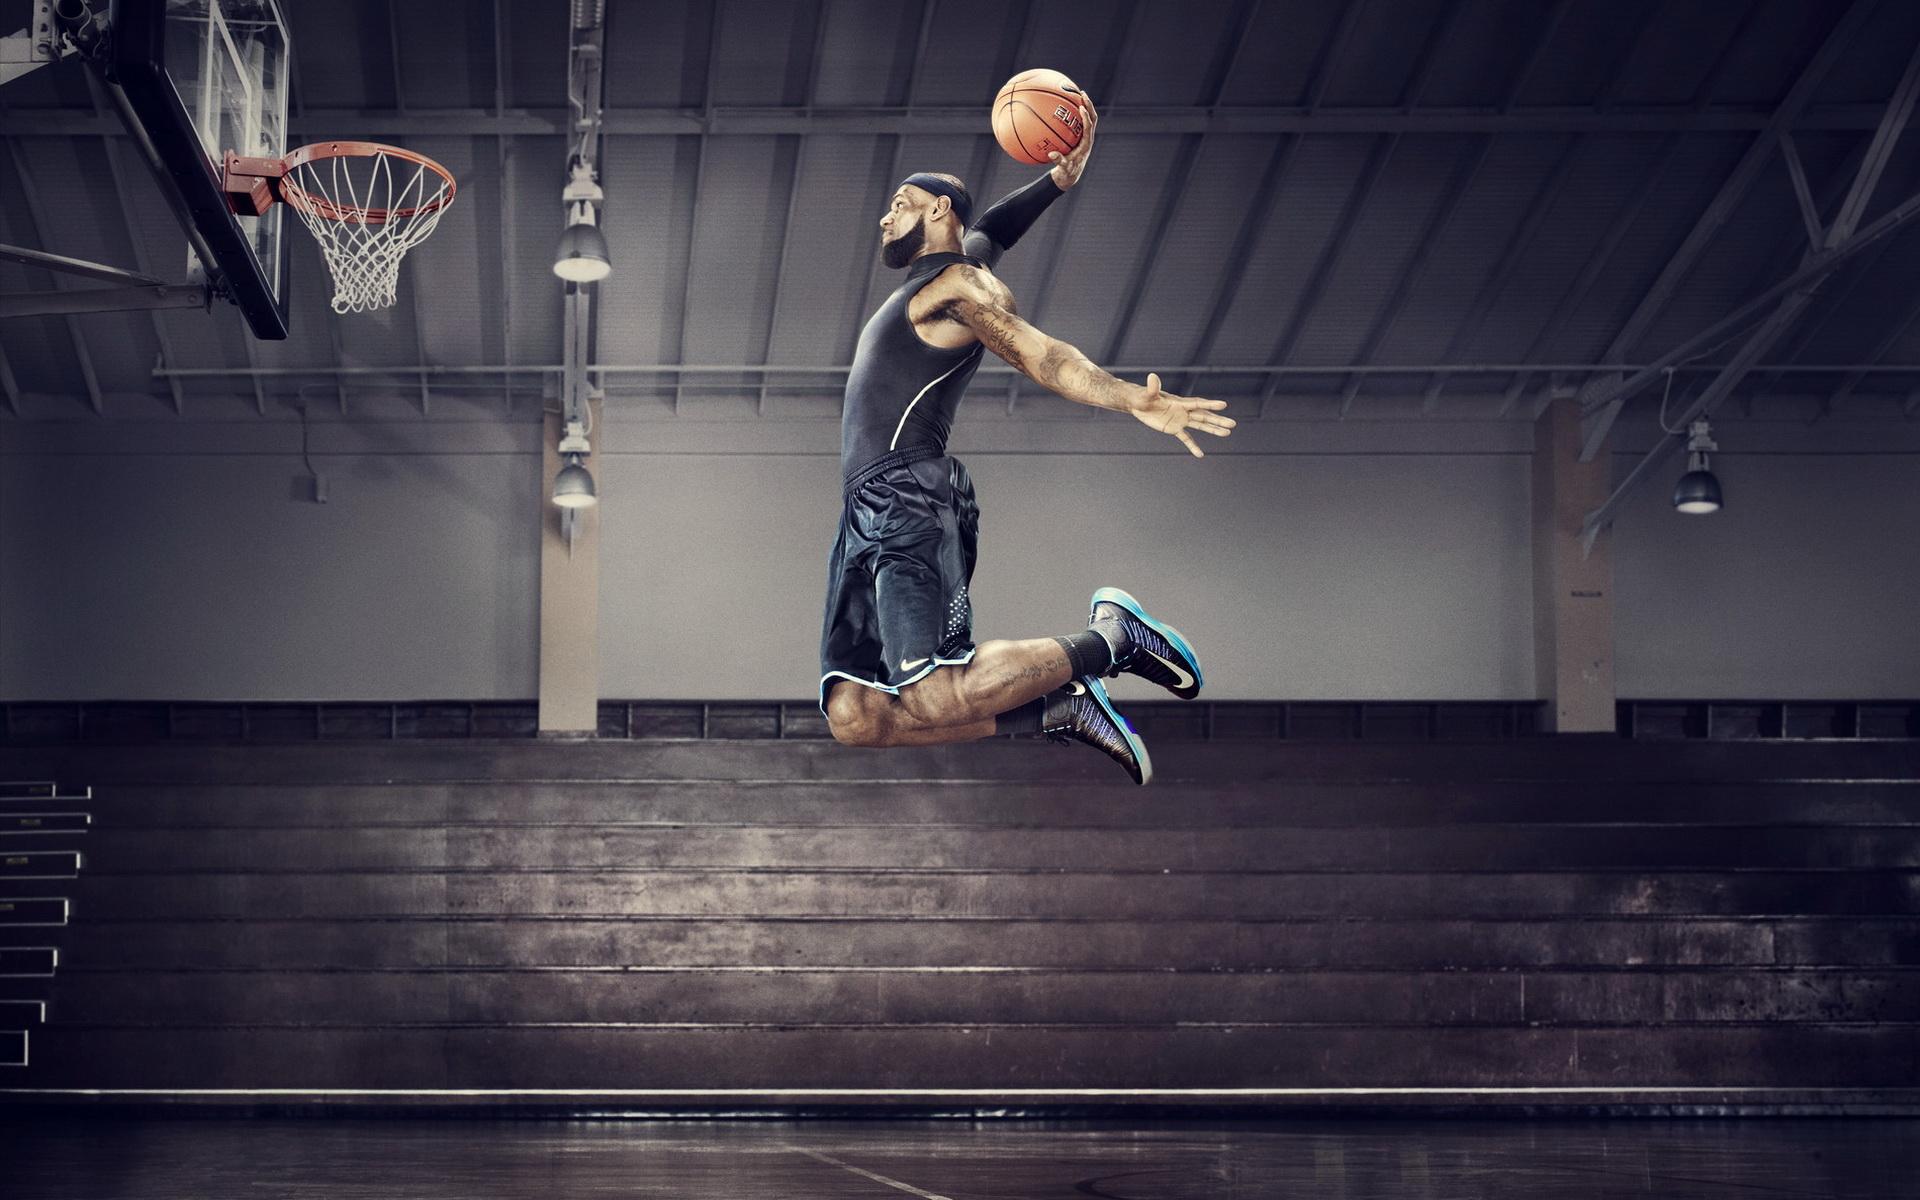 Sportbasketball033668